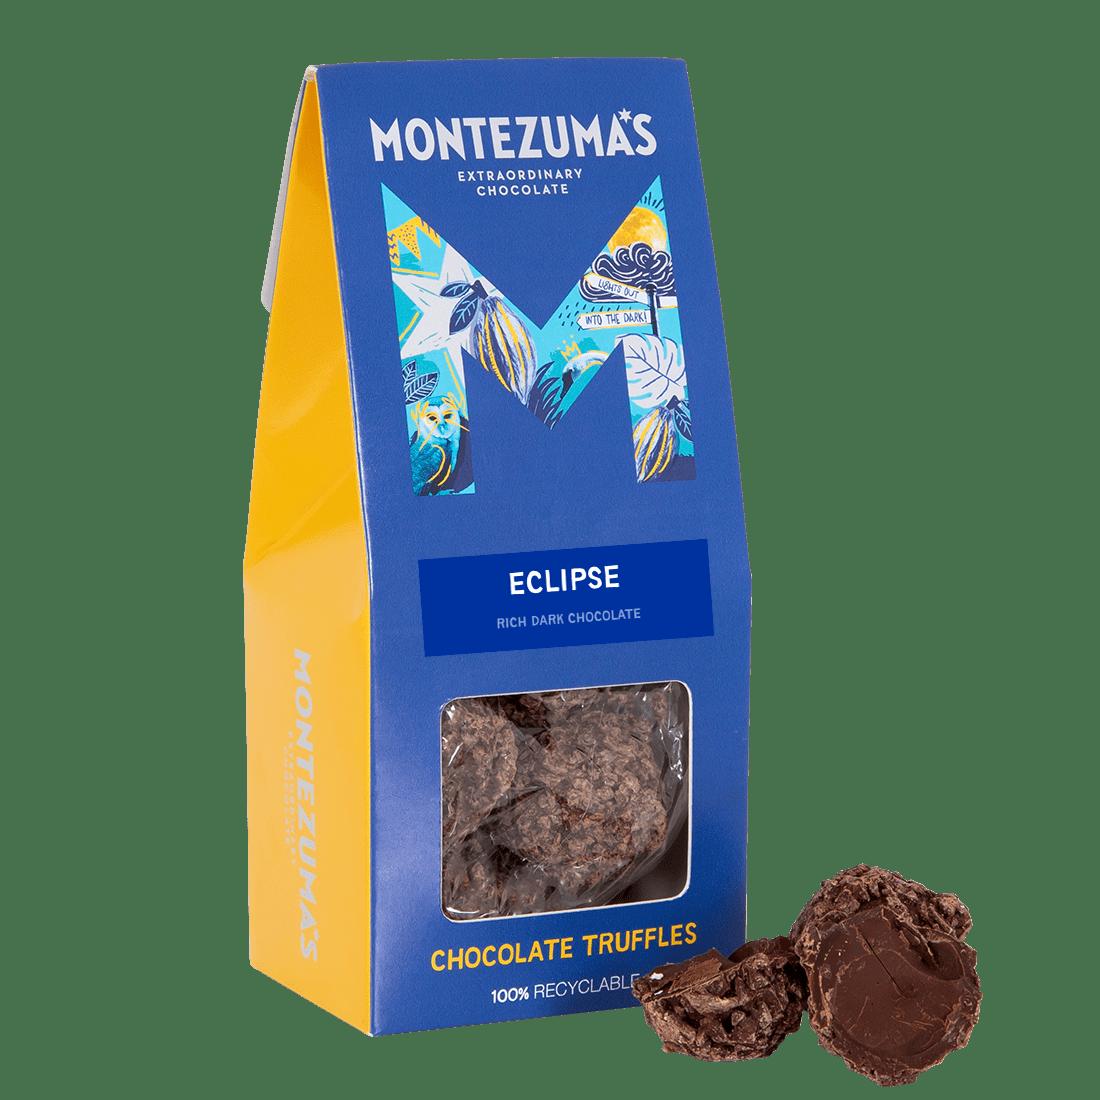 Eclipse - Dark Chocolate Truffles